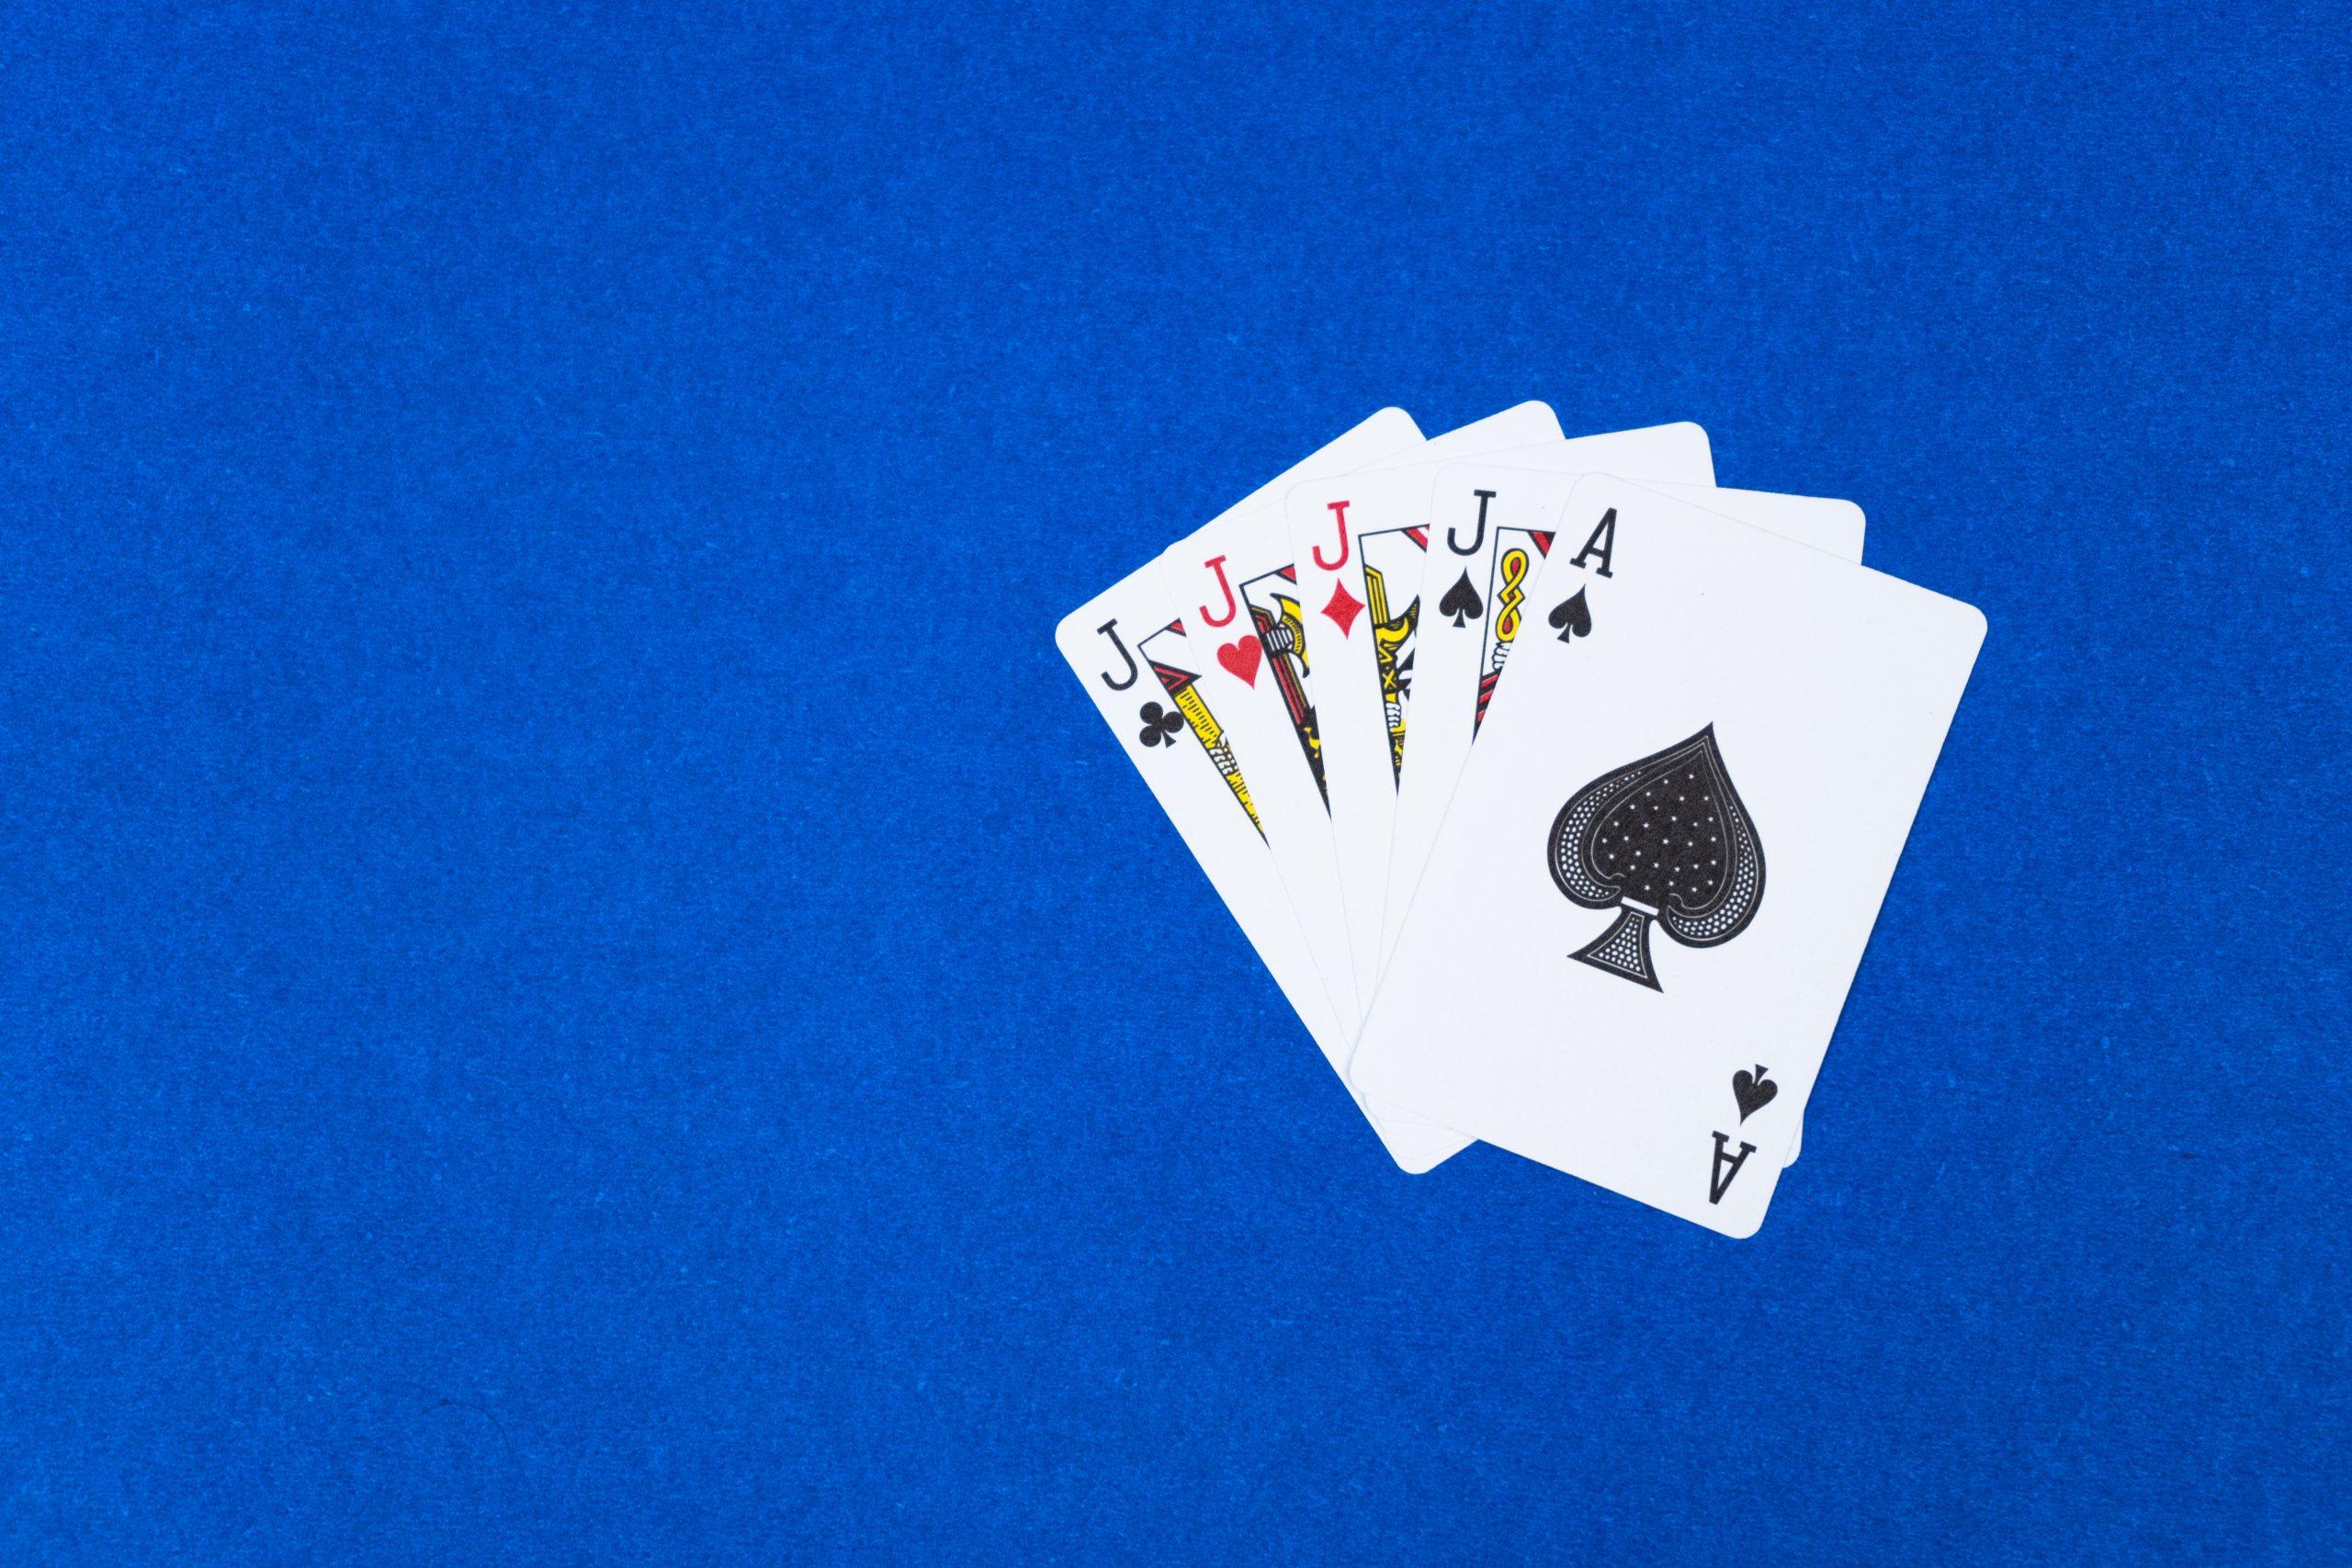 Poker Four of a kind hand